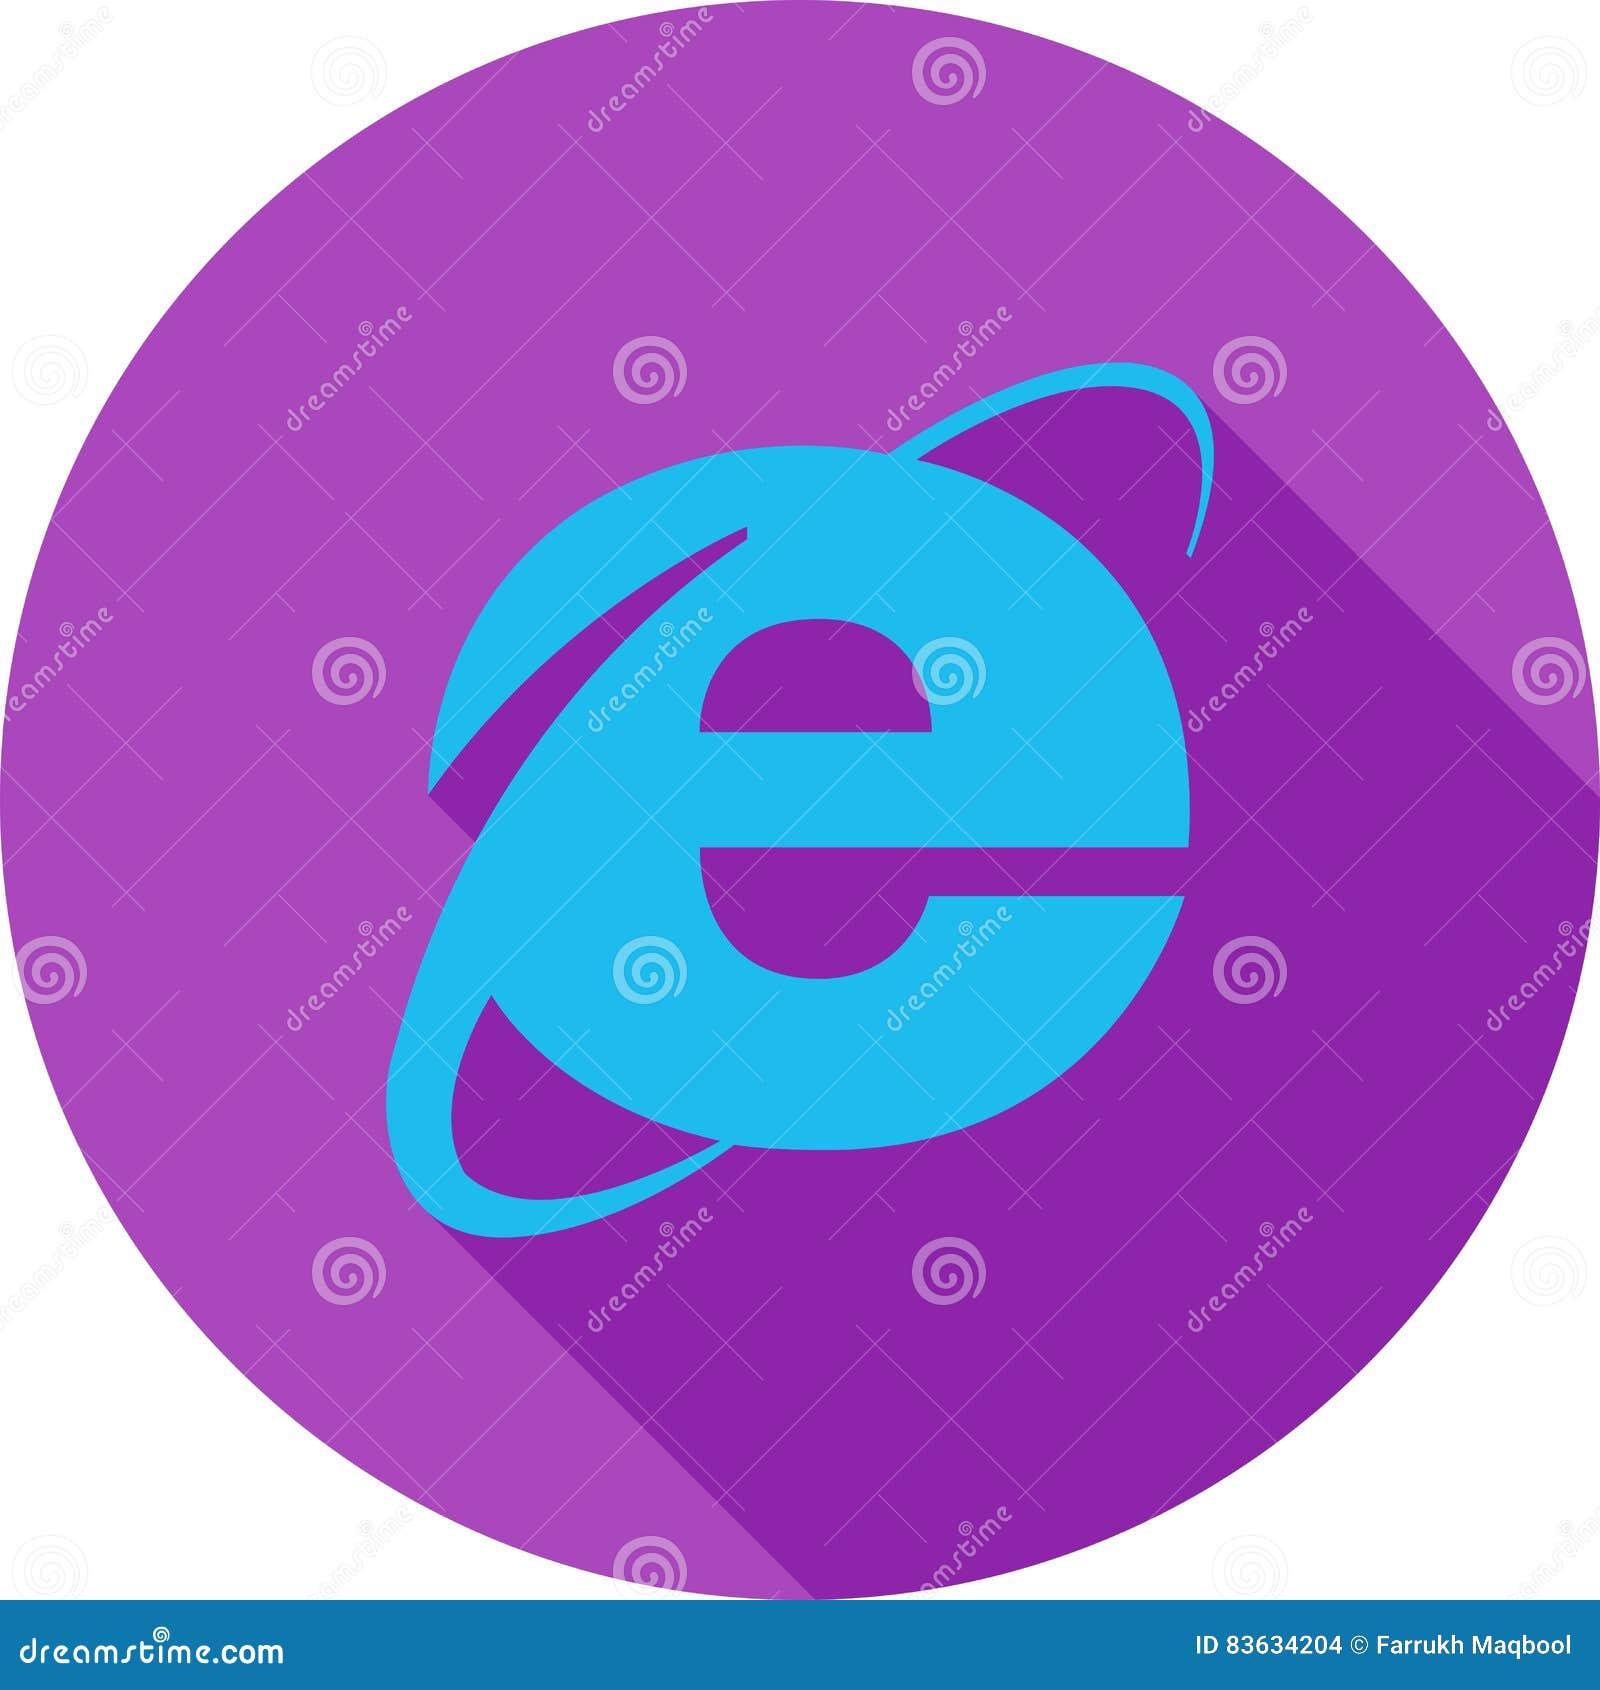 Internet Explorer Editorial Stock Image Illustration Of Internet 83634204